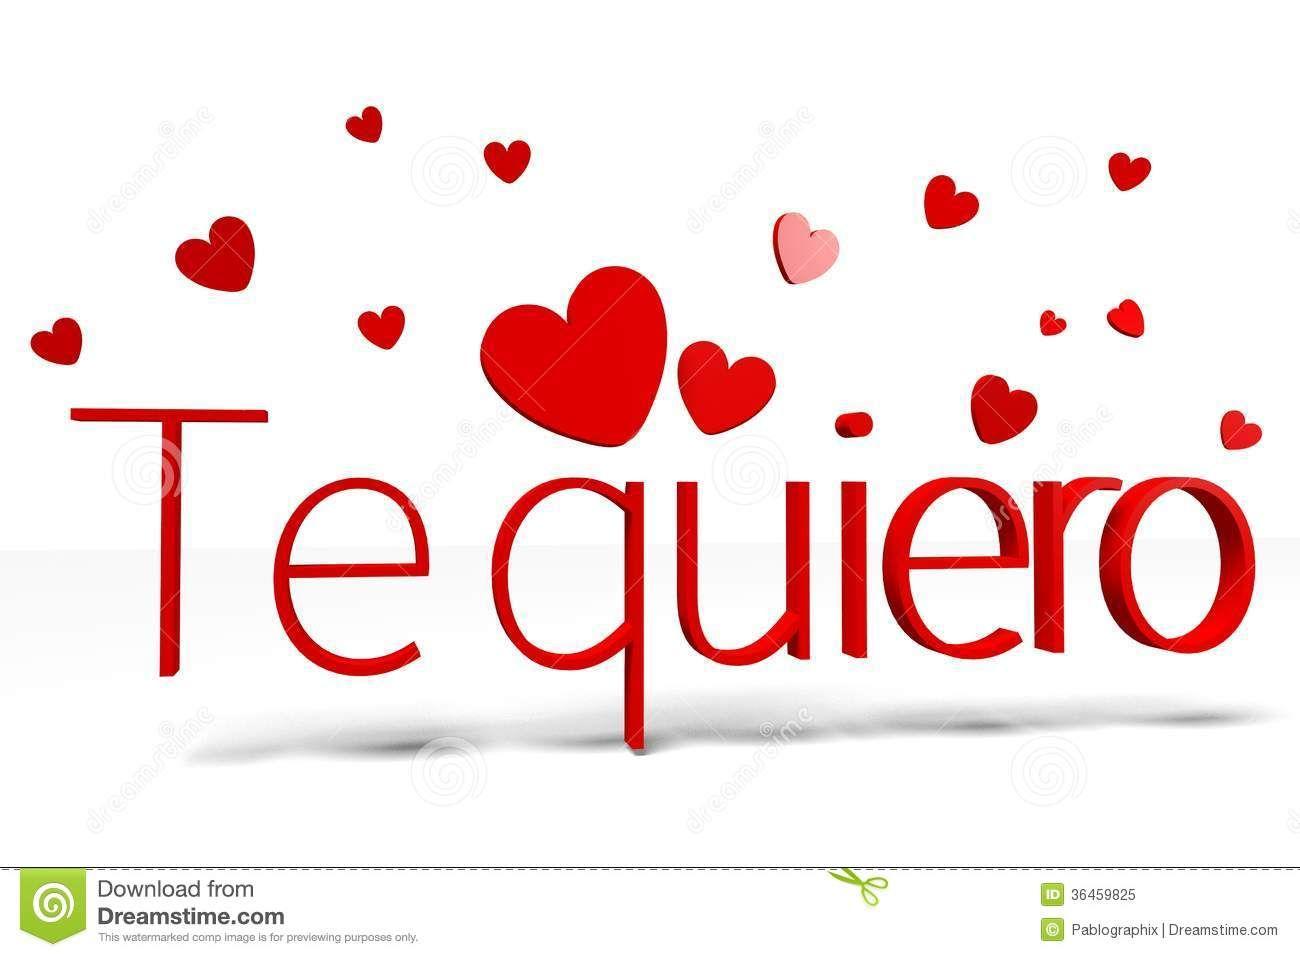 3D graphics, Valentine s Day, 14th February, Te quiero